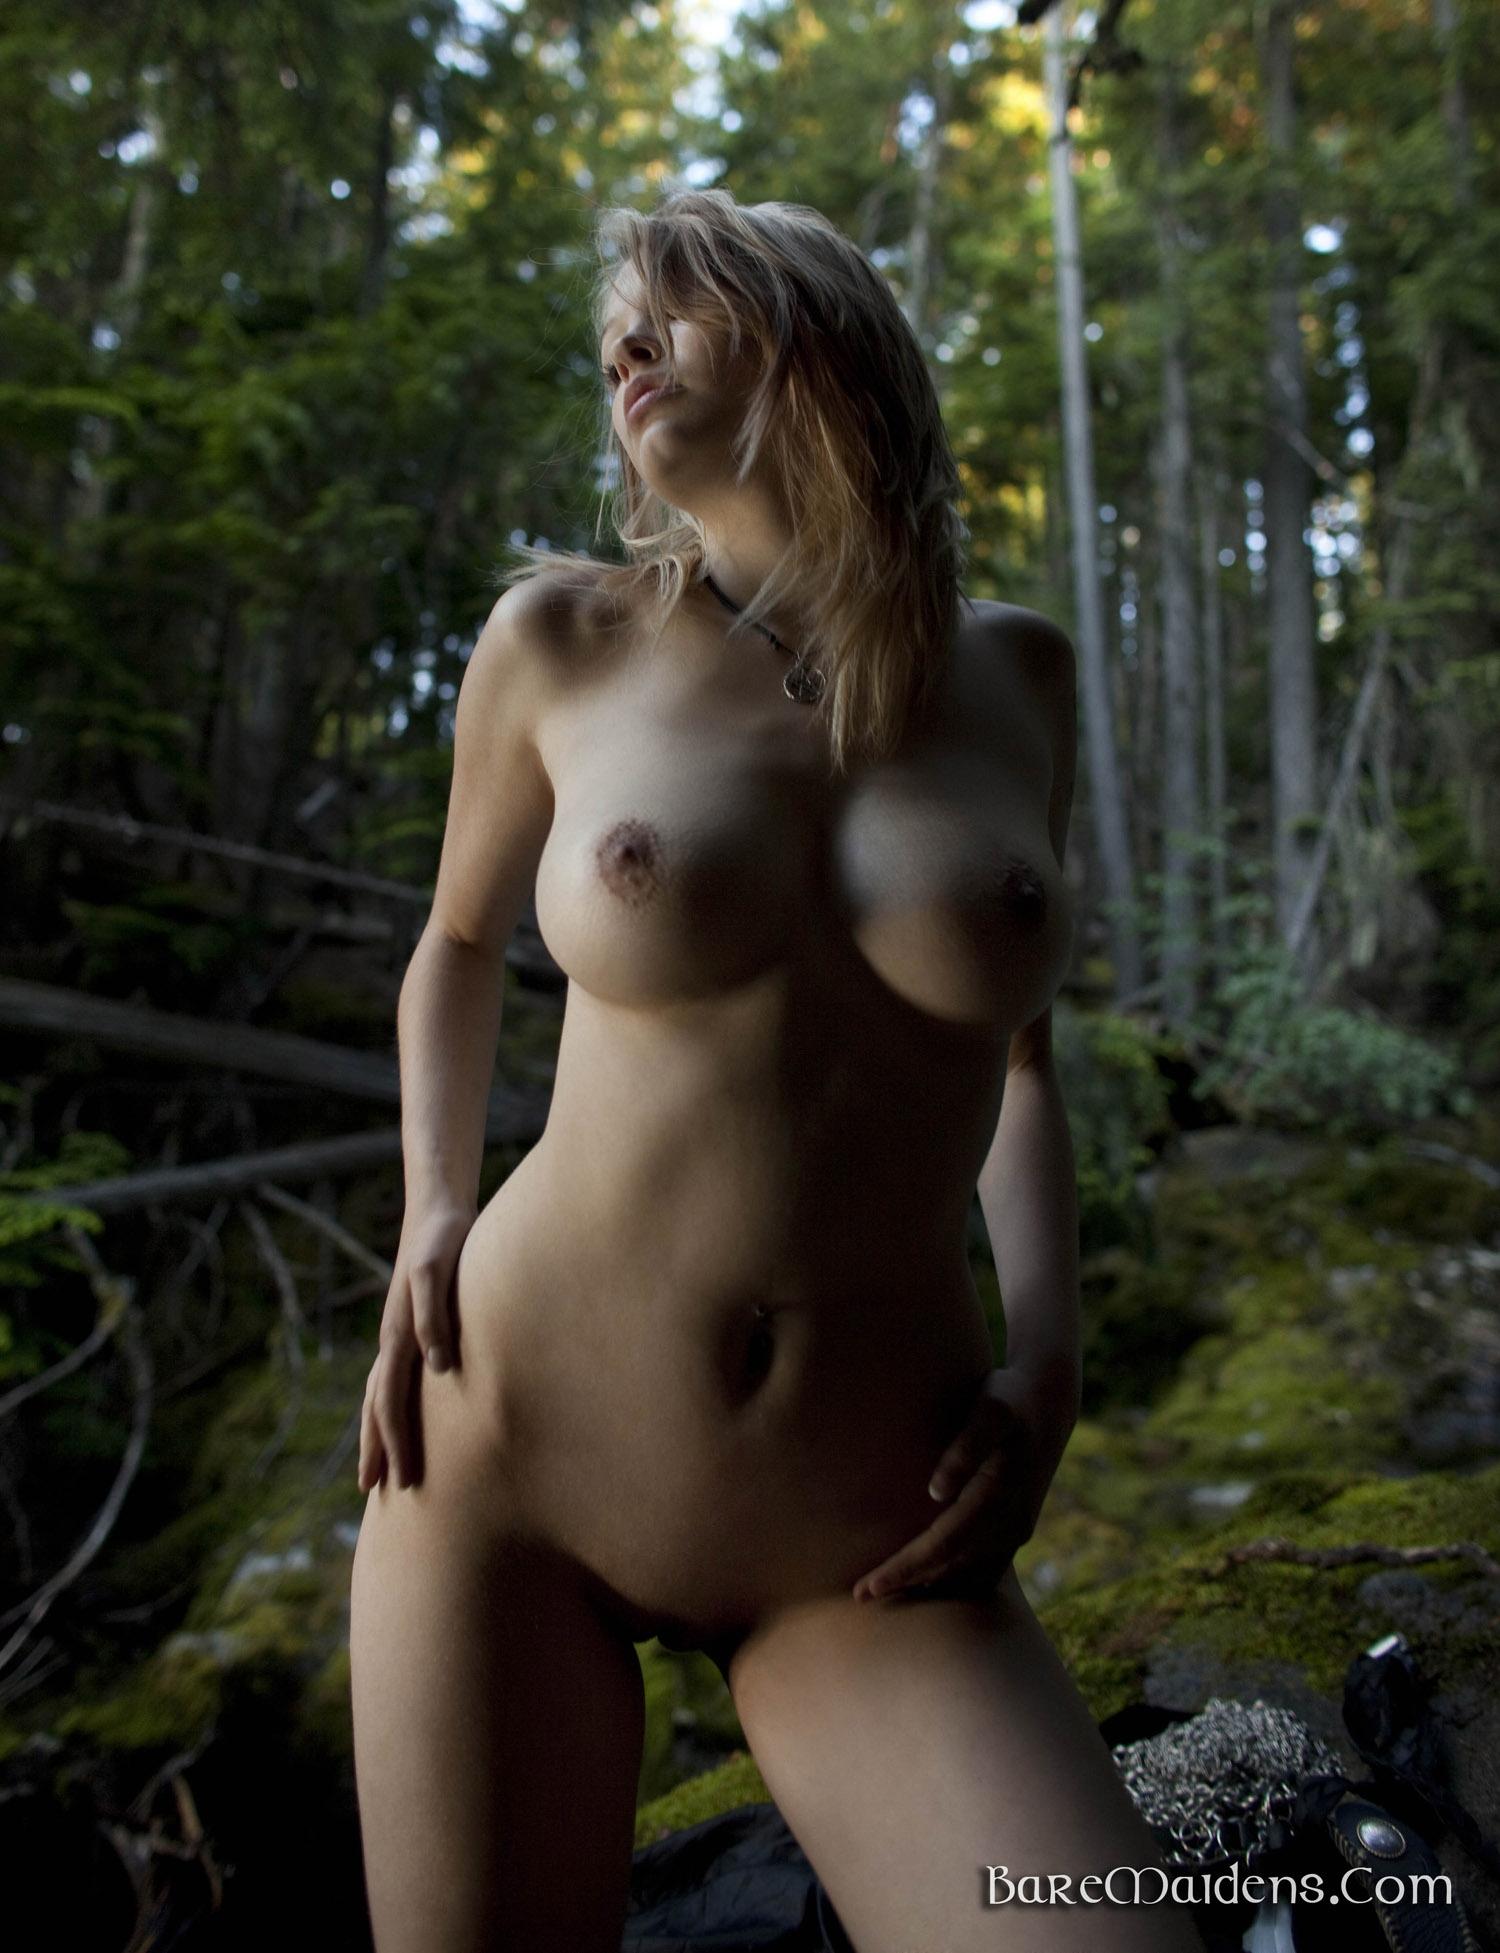 A naked girls boobs